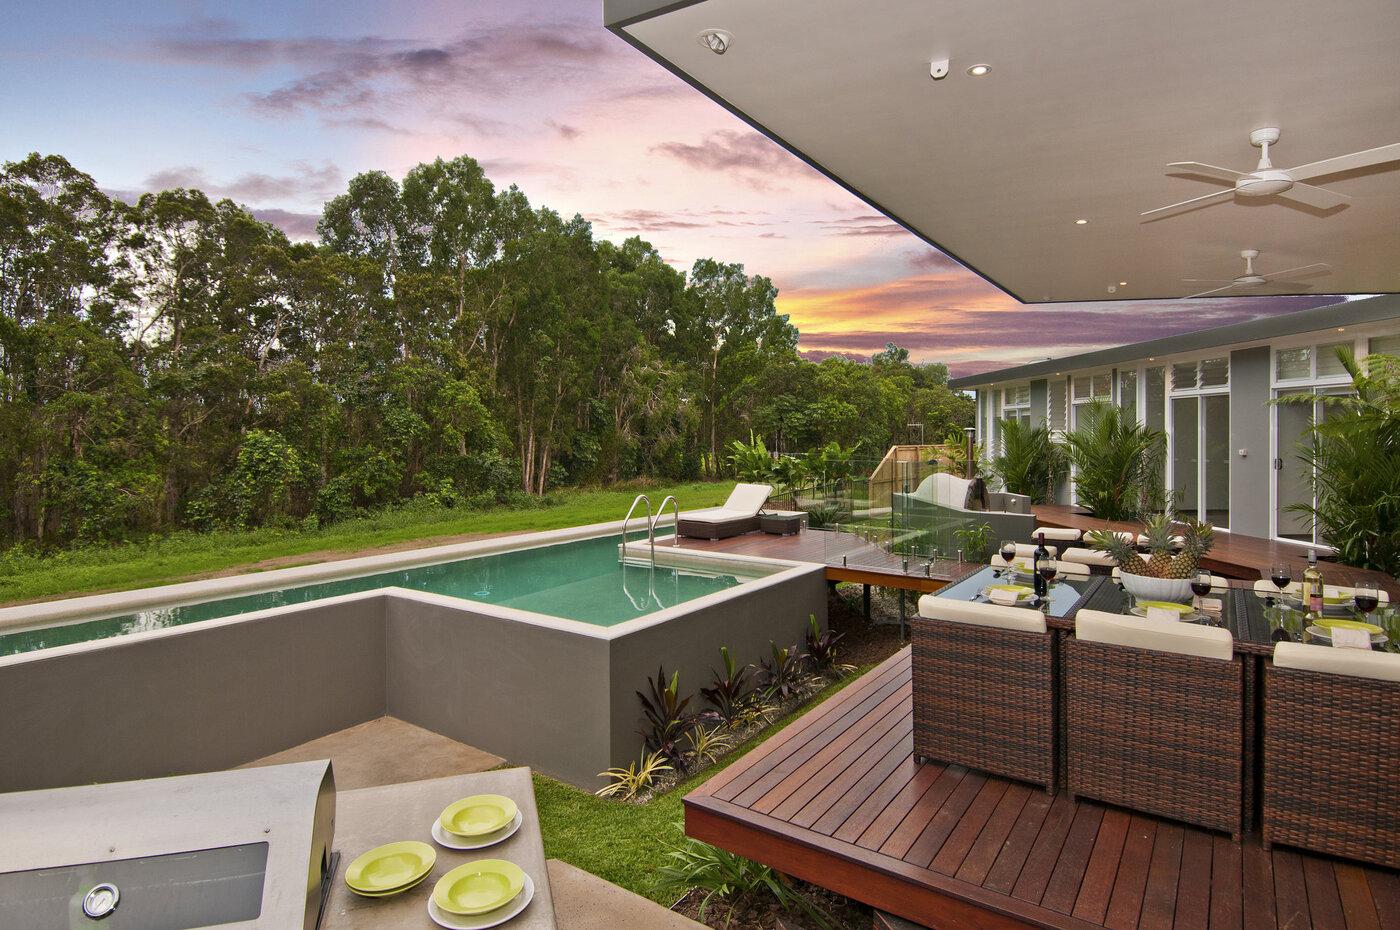 Outdoor dining area overlooking free standing pool